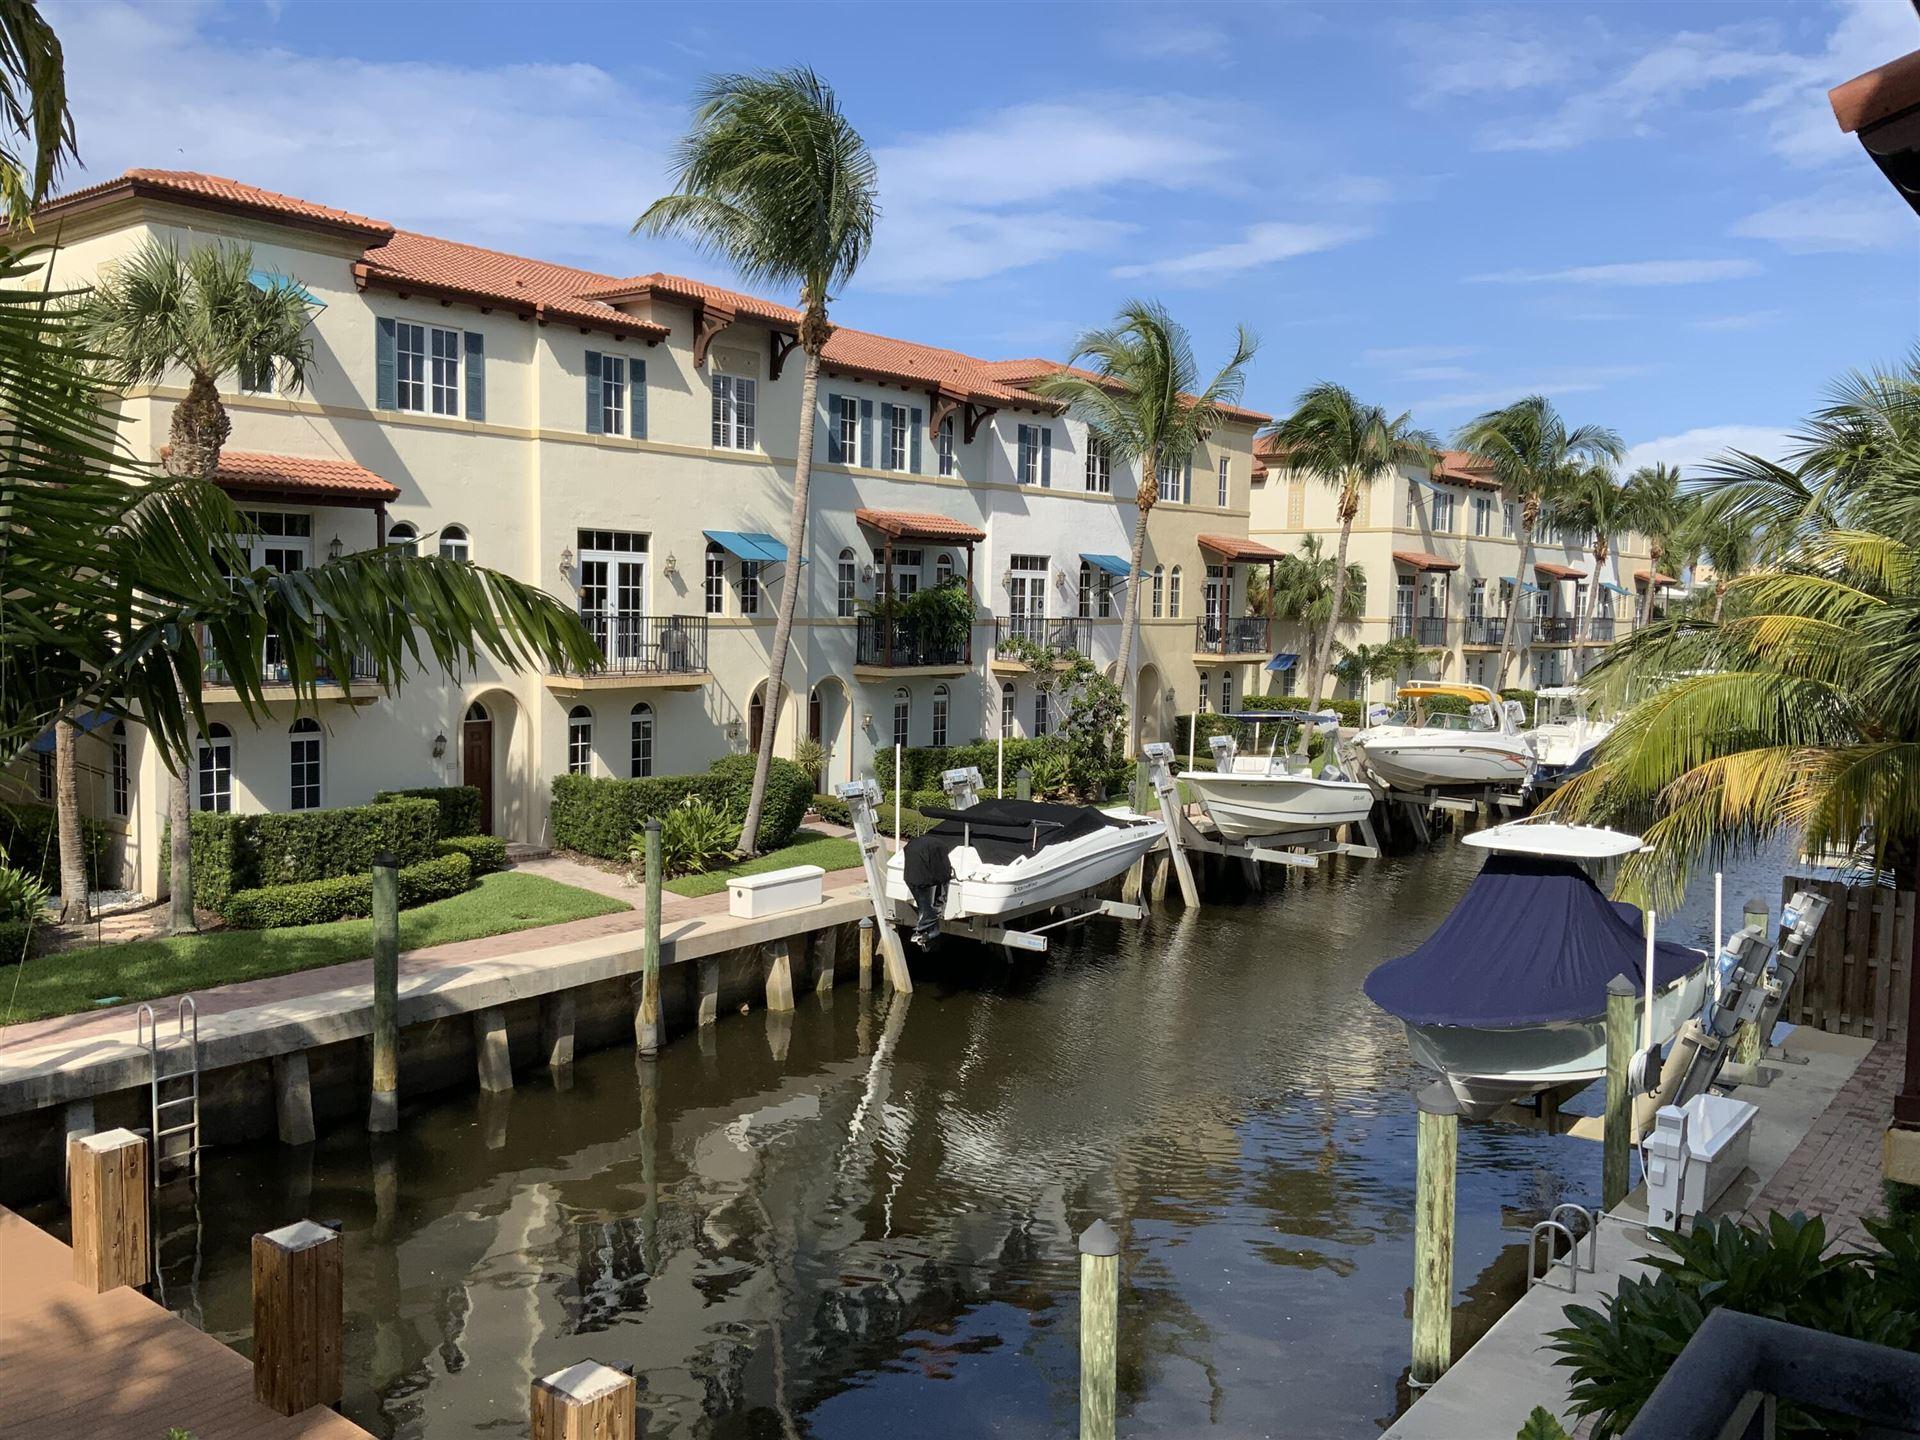 811 Estancia Way, Boynton Beach, FL 33435 - #: RX-10746022